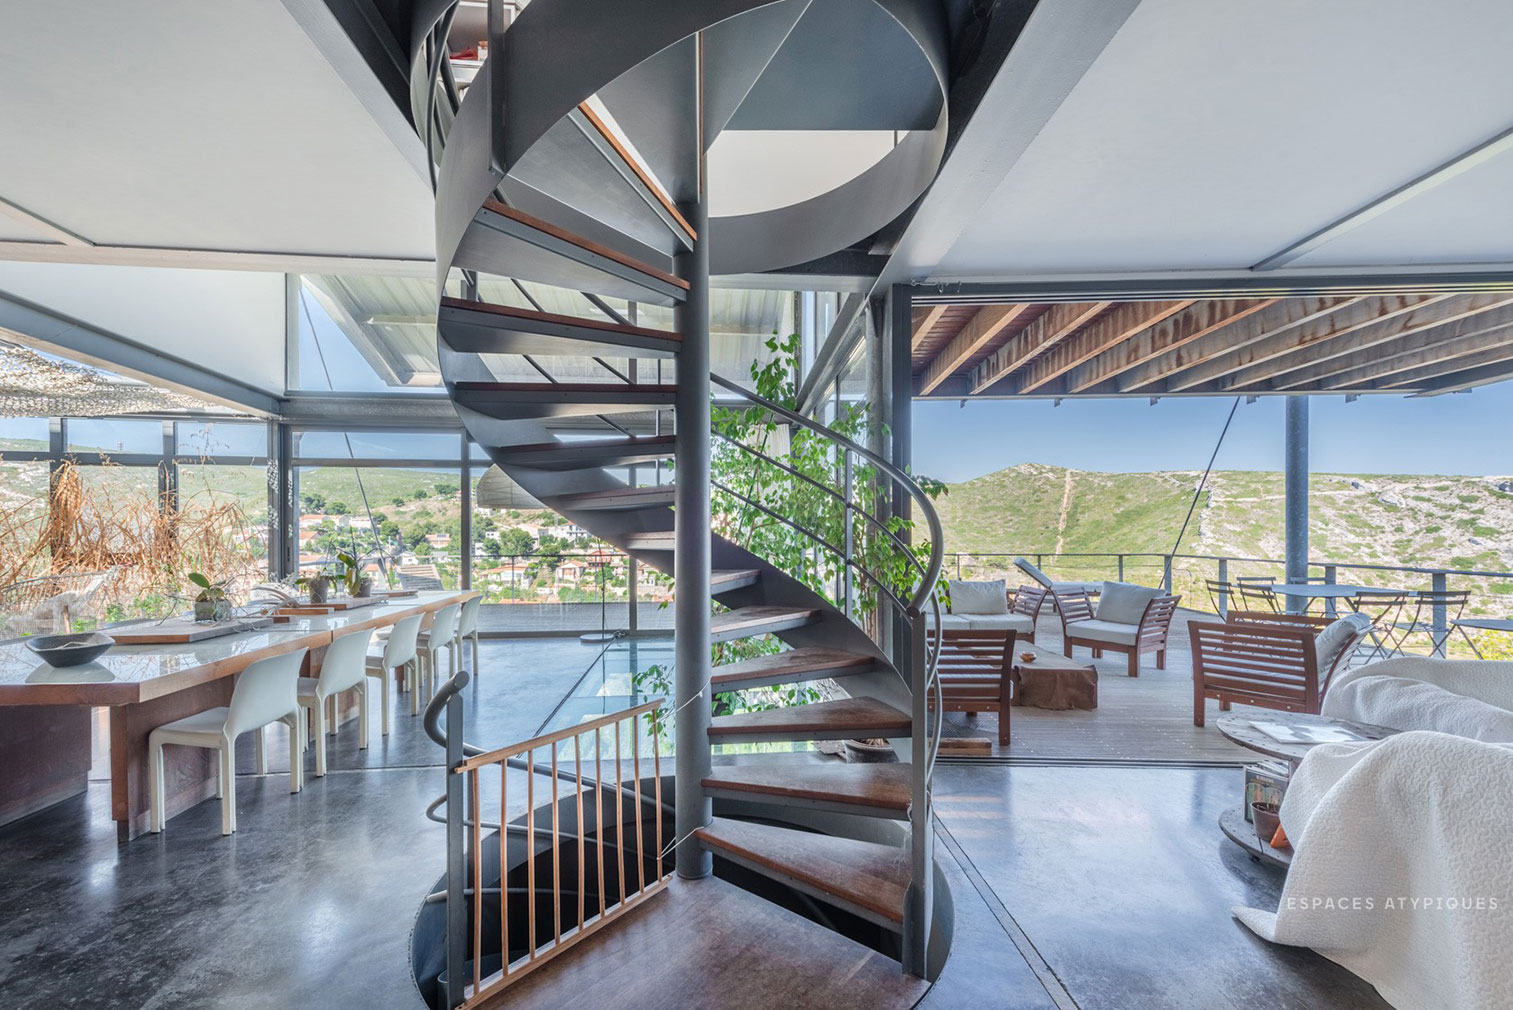 Villa for sale near Marseille, France